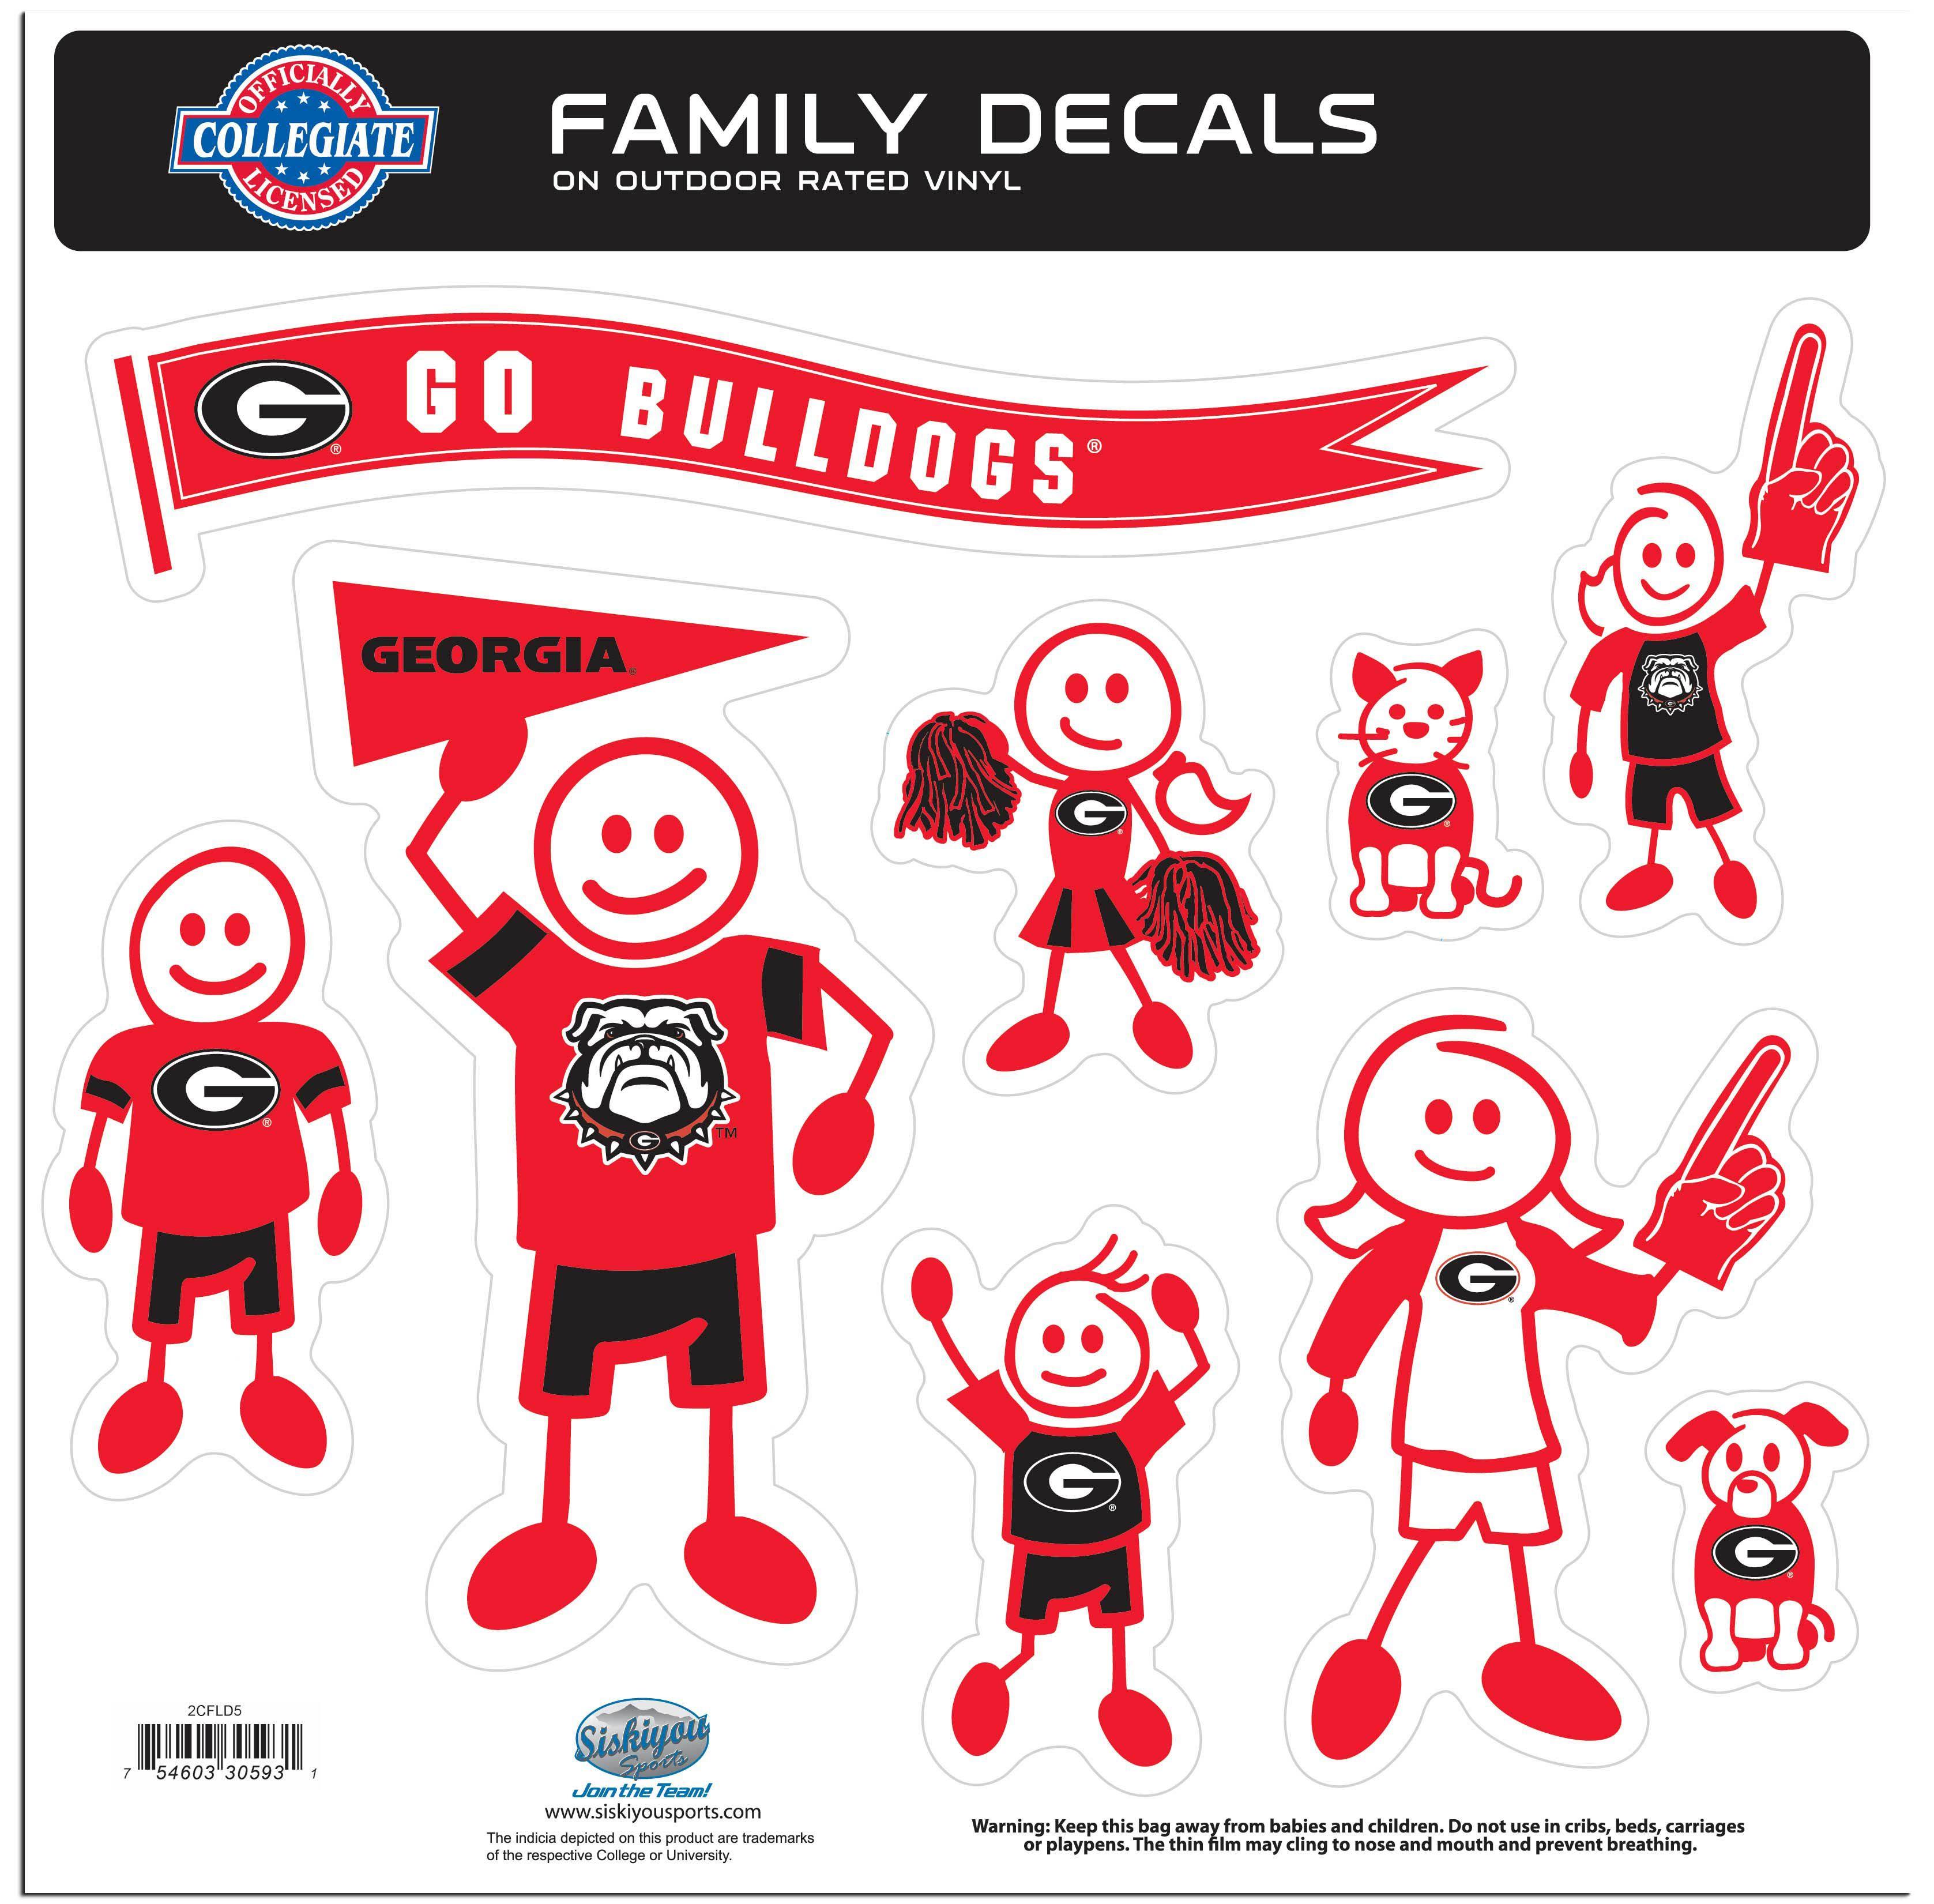 Georgia Bulldogs Large Family Decal Set In 2020 Family Decals Georgia Bulldogs Team Sports Gifts